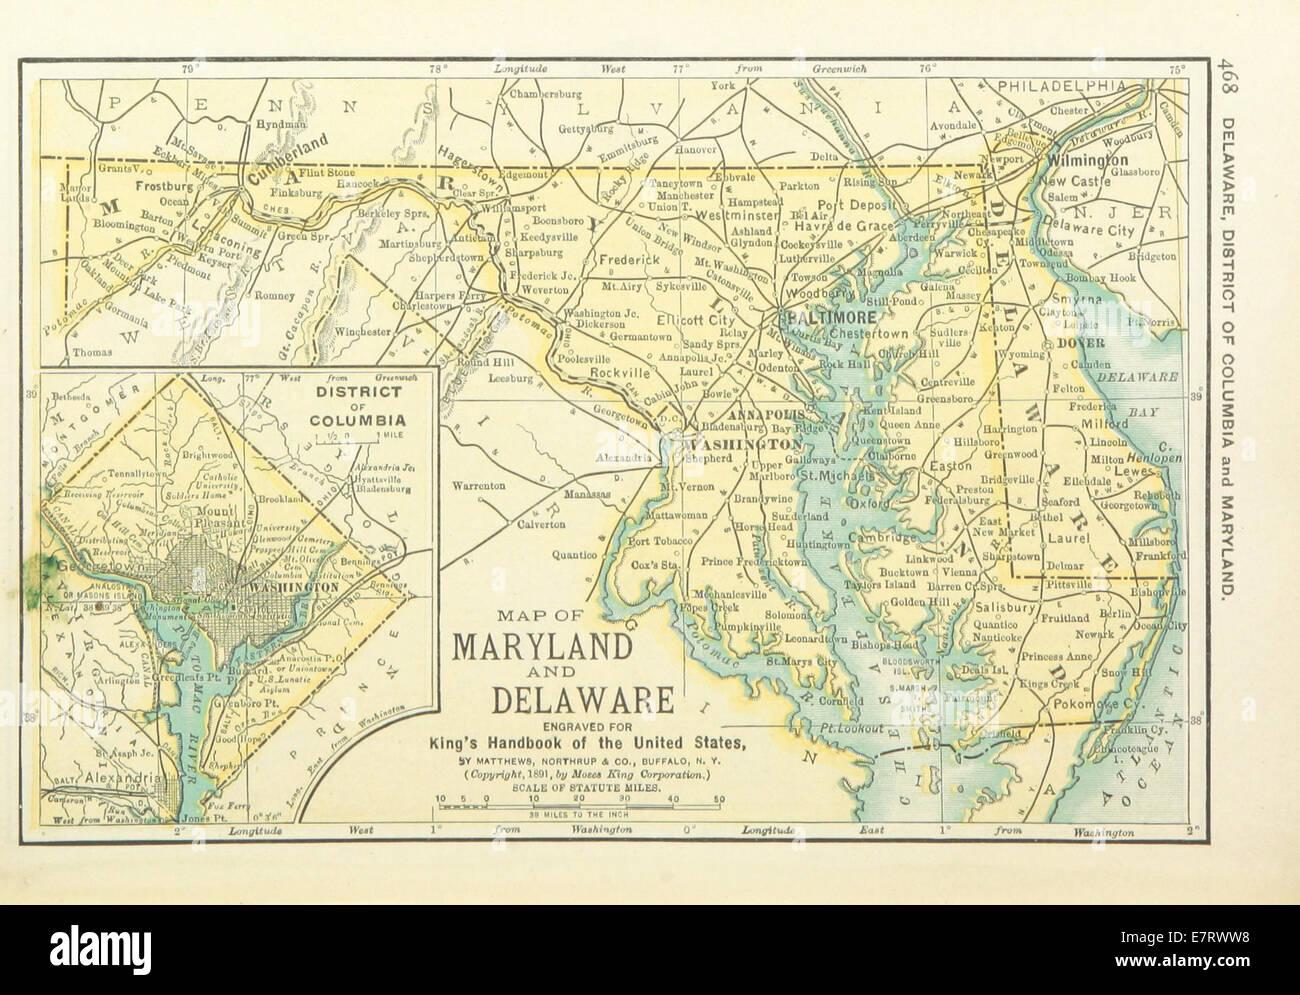 Map Columbia Stockfotos & Map Columbia Bilder - Seite 3 - Alamy